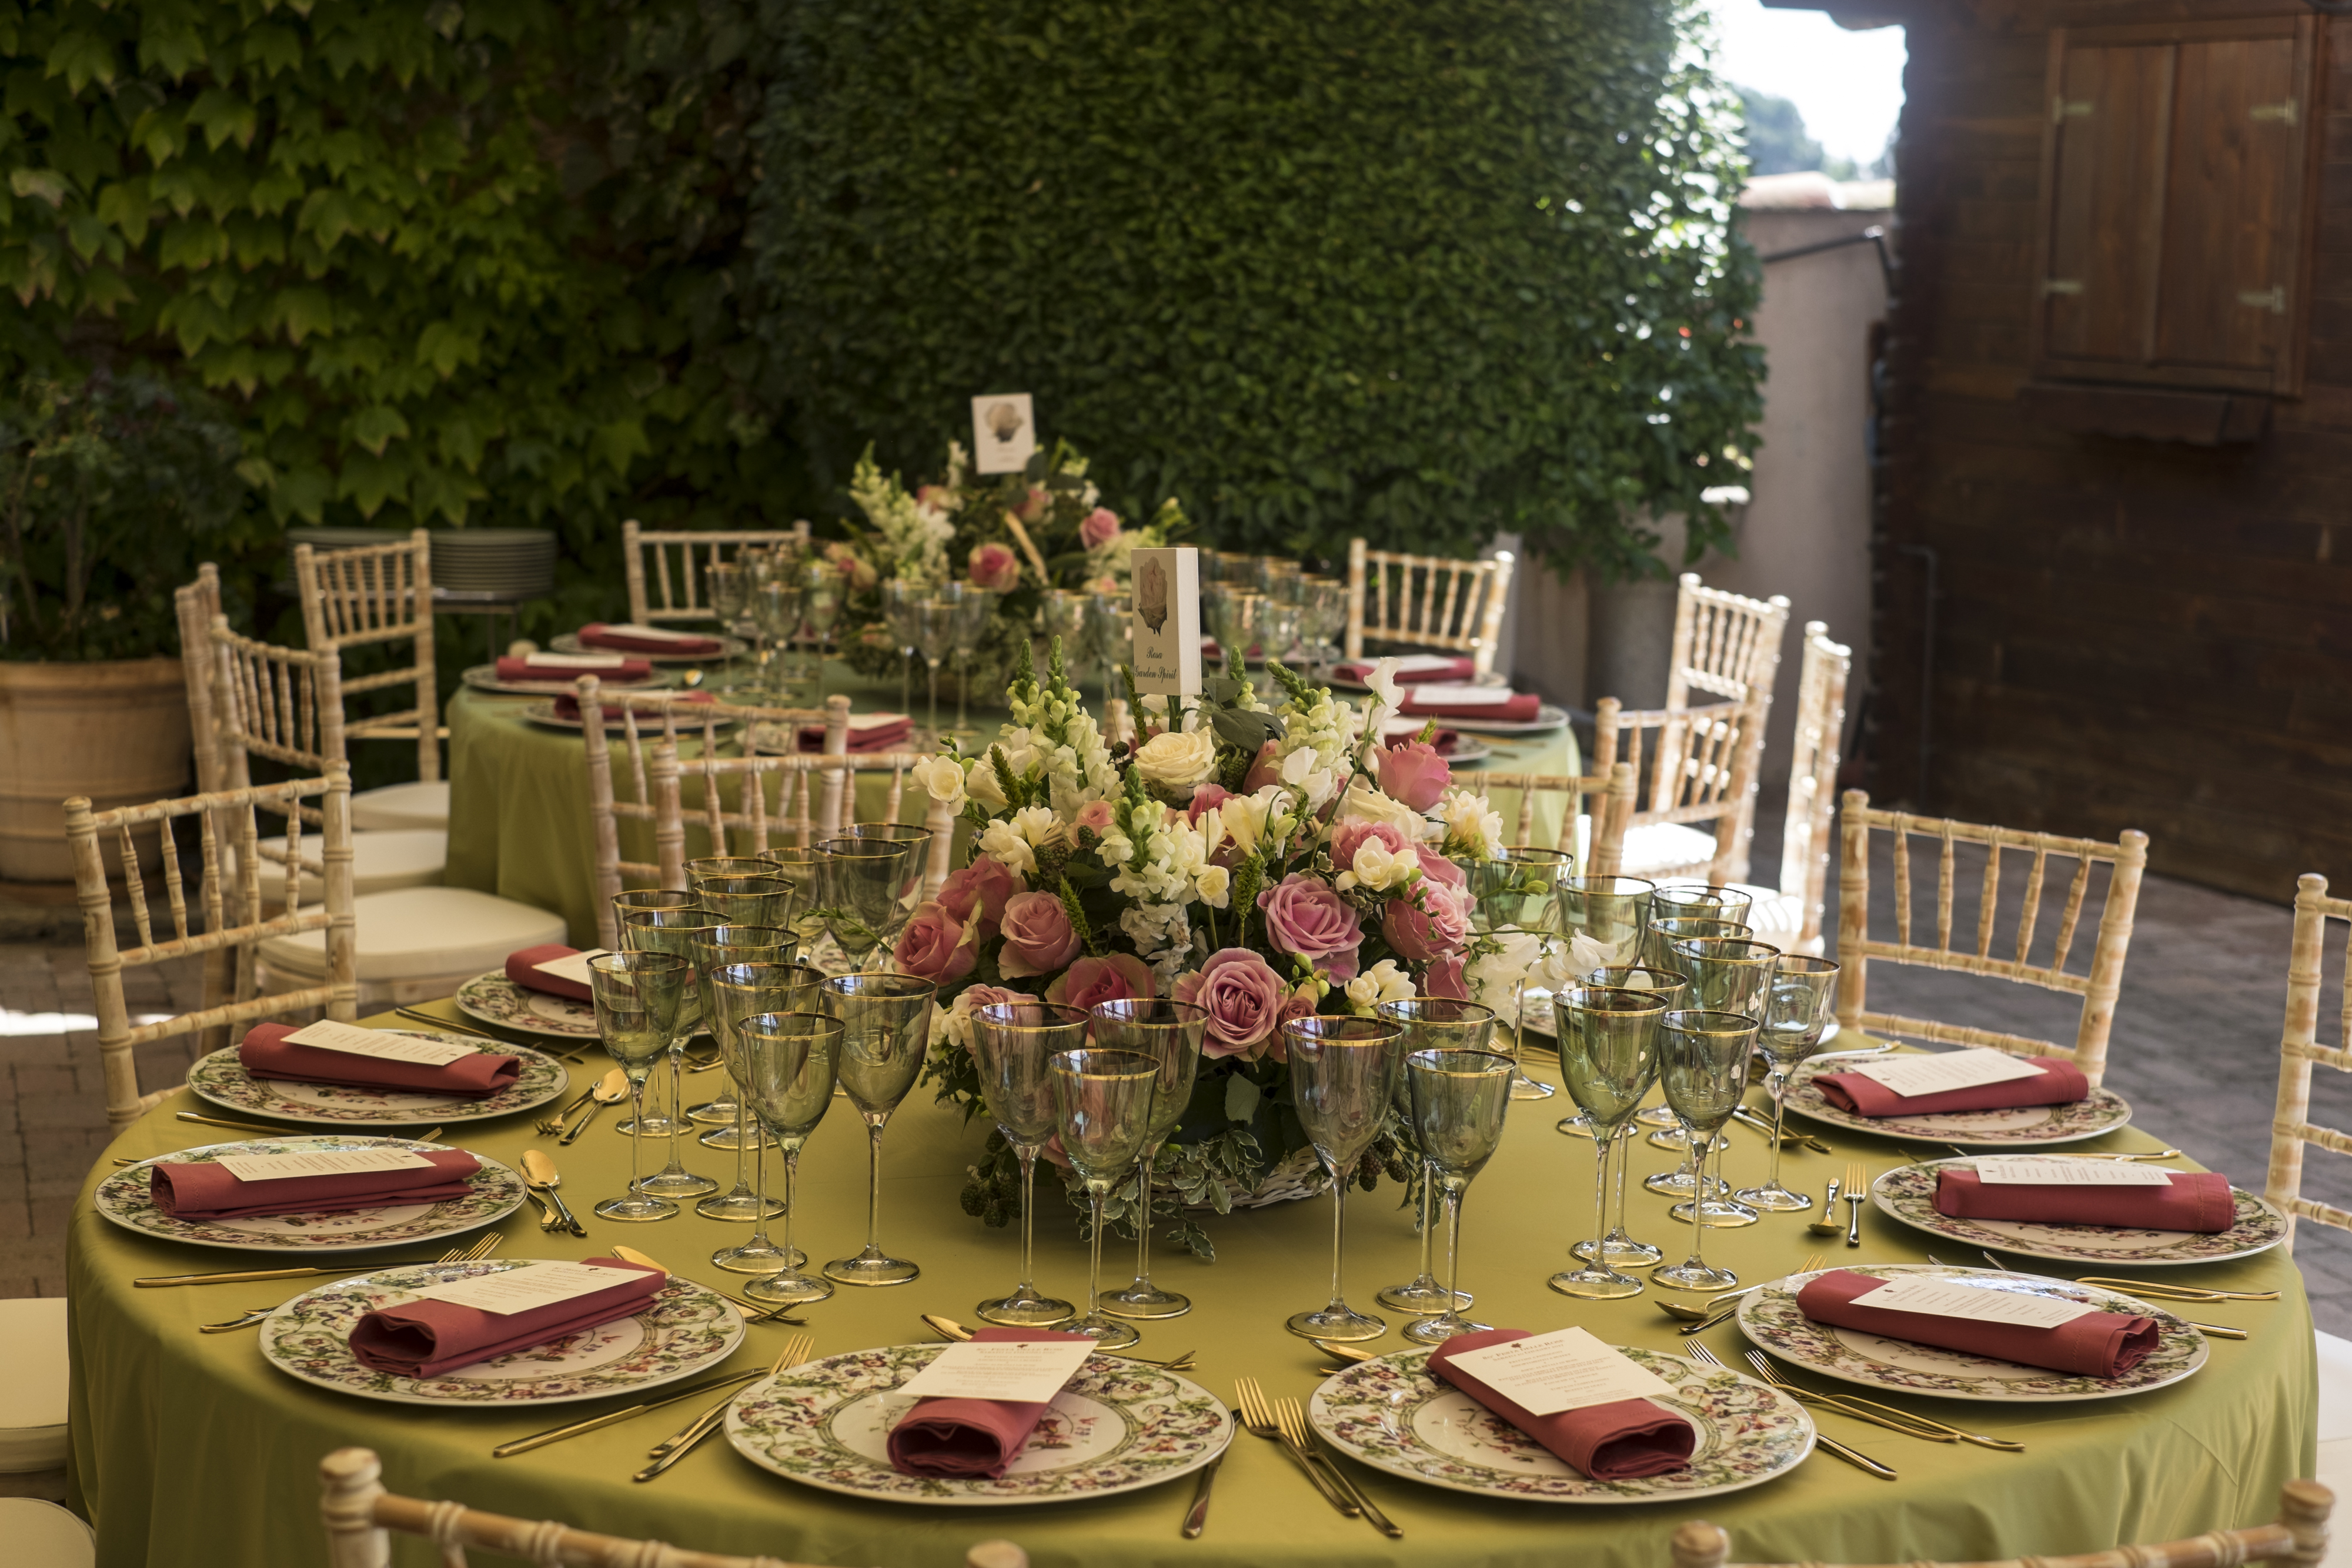 festa-delle-rose-luciana-lombardi-2017-stranges-407